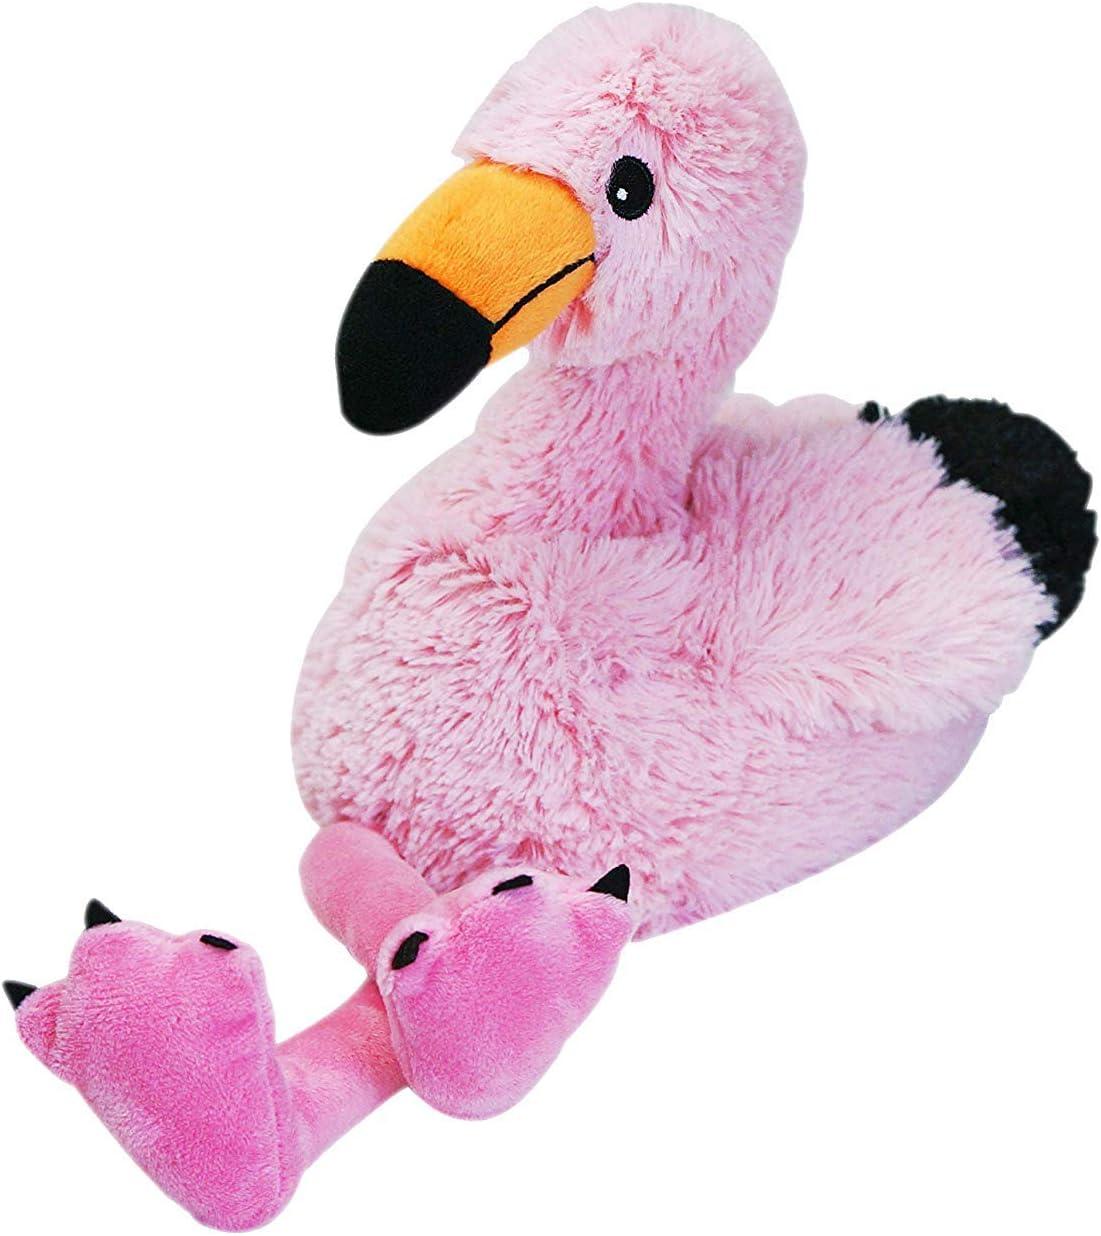 Warmies Flamingo Cozy Plush Heatable Lavender Scented Stuffed Animal